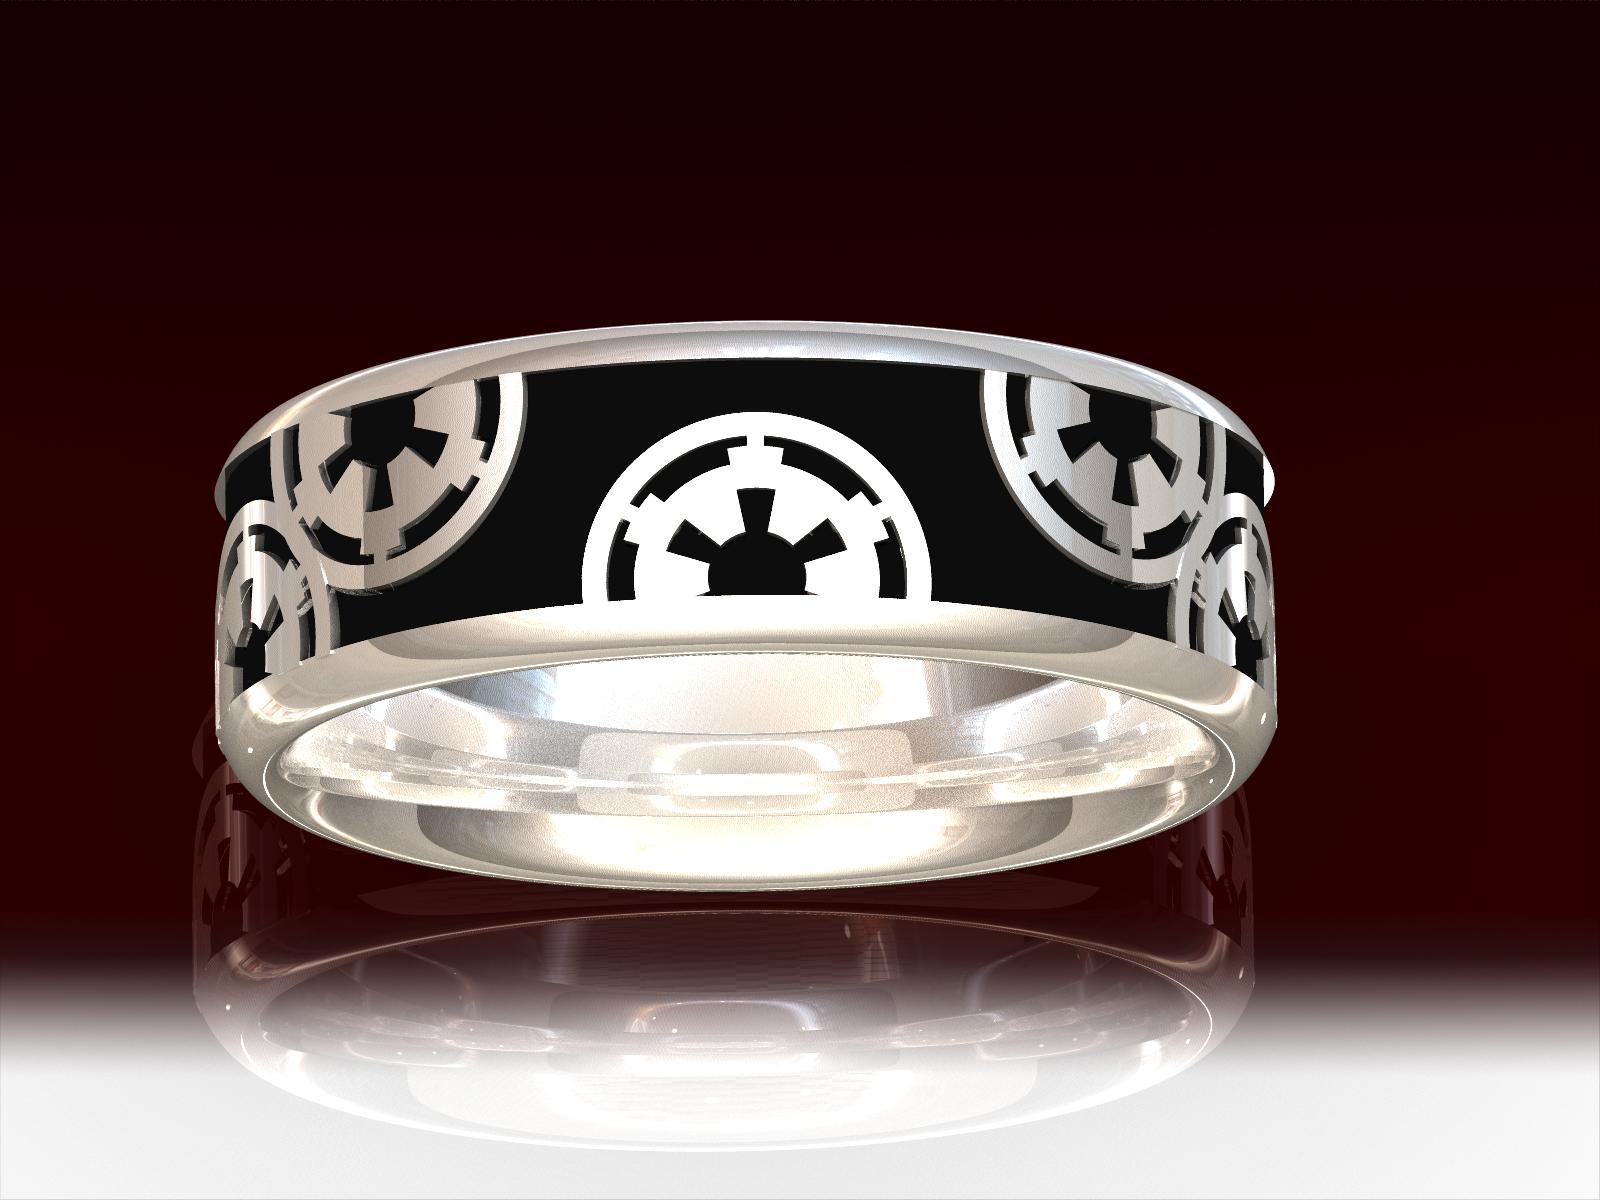 star wars wedding ring